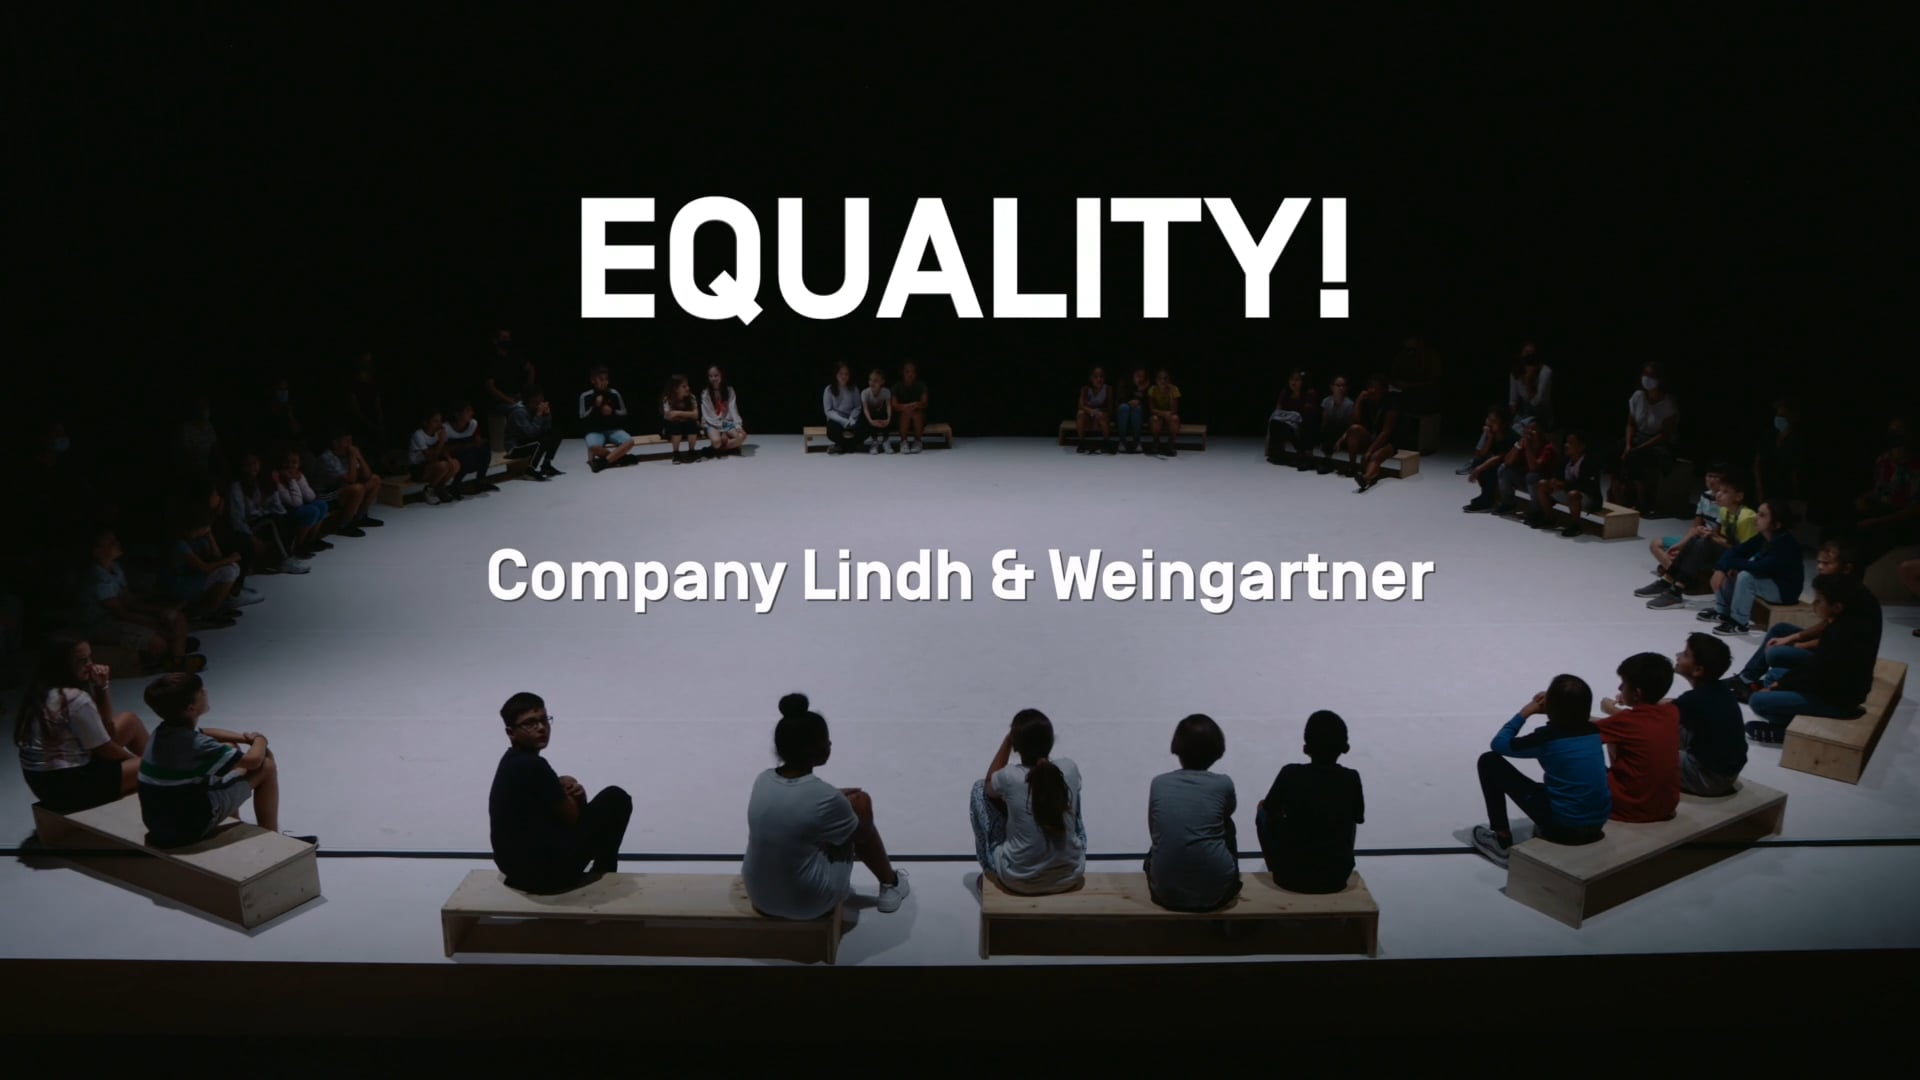 EQUALITY! Company Lindh & Weingartner